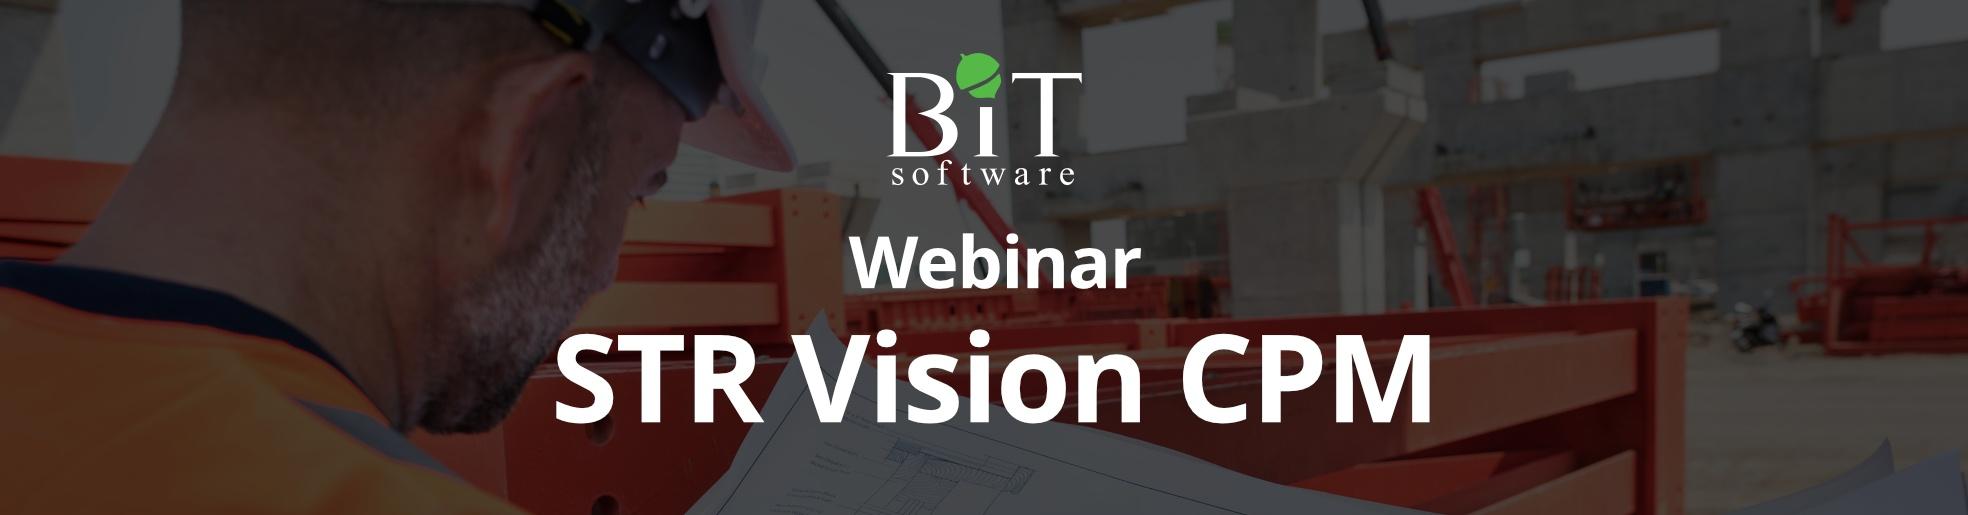 Webinar-STR-Vision-CPM